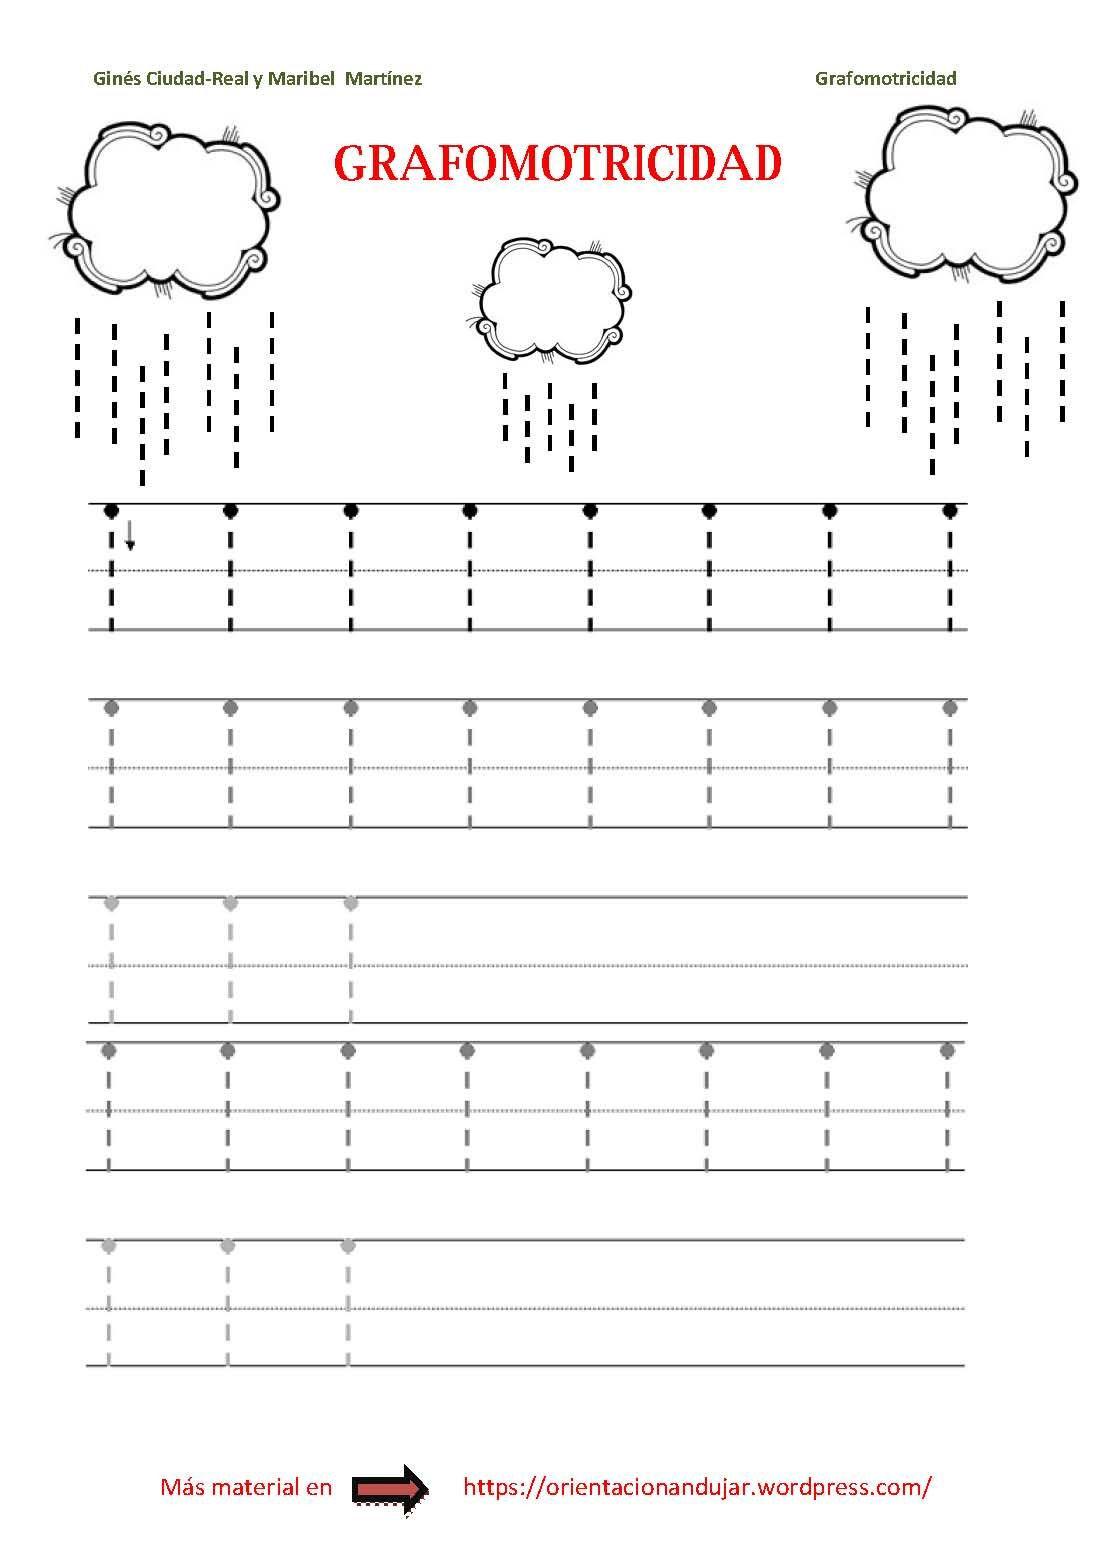 Horizontal and Vertical Lines Worksheet Straight Line Graphs Worksheet